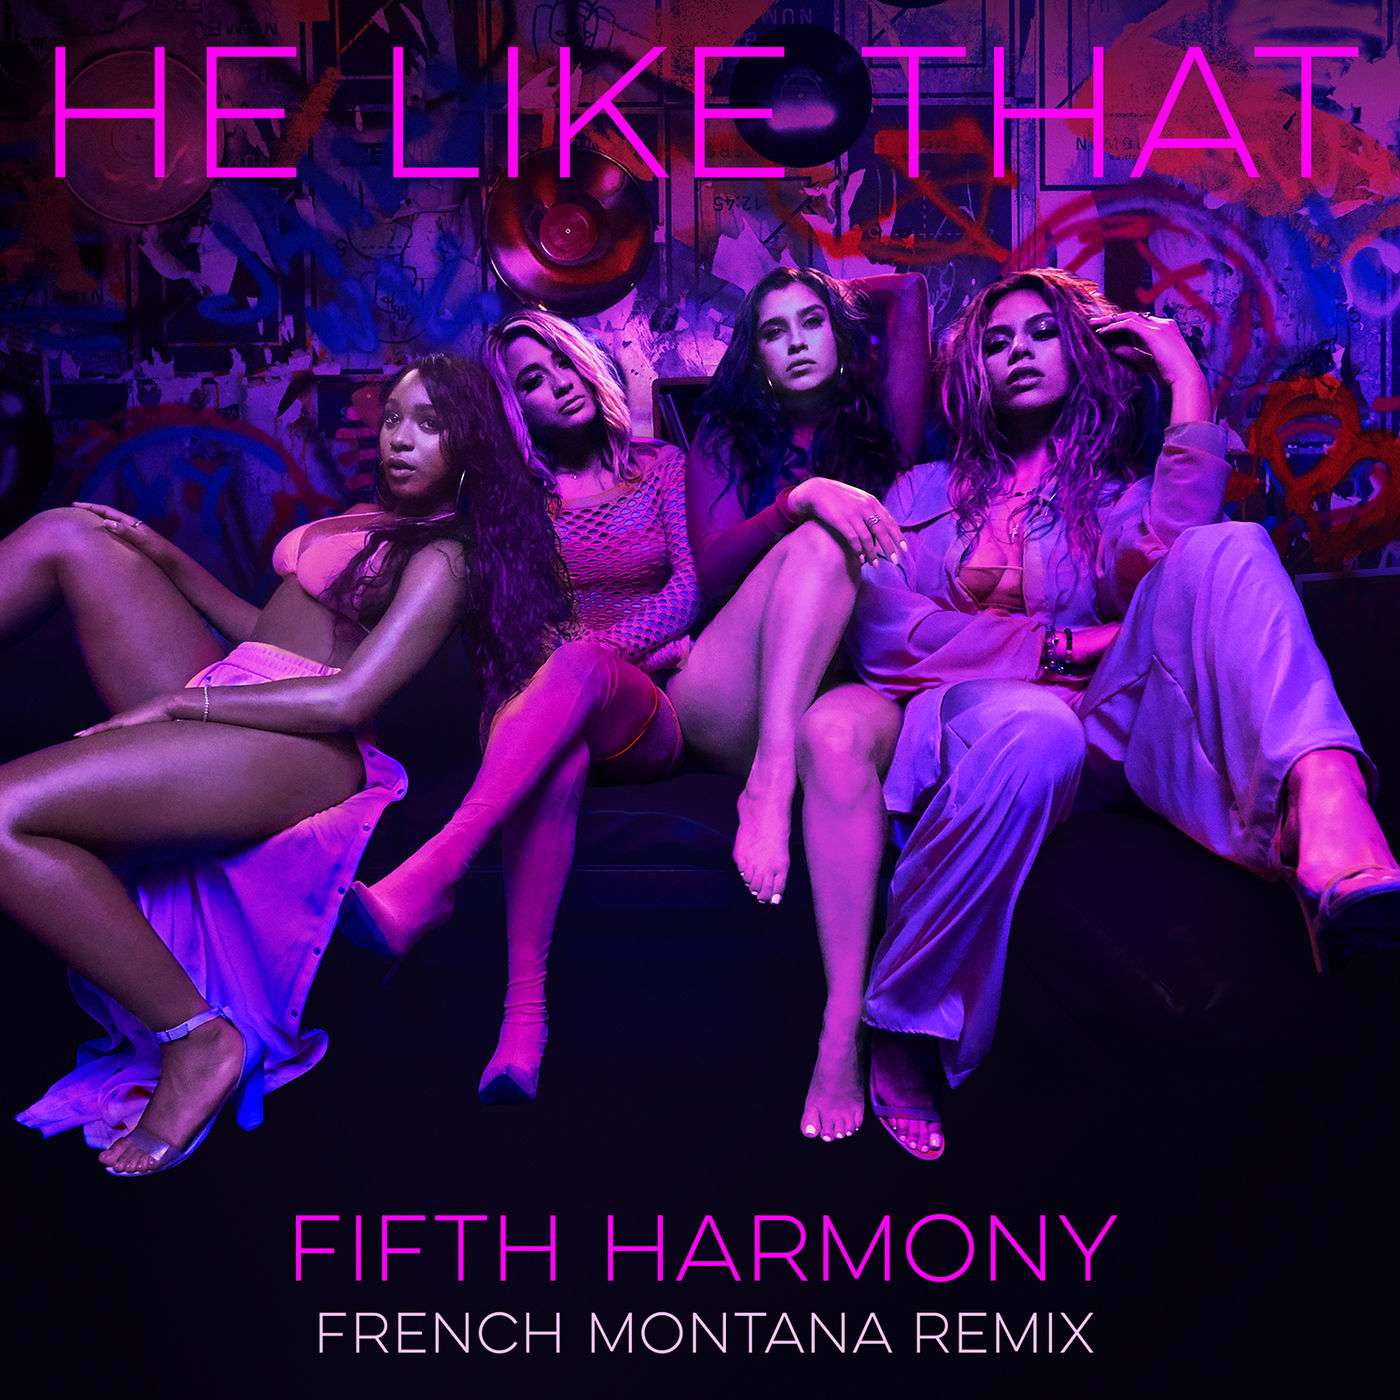 Fifth Harmony - He Like That (French Montana Remix) [feat. French Montana] - Single